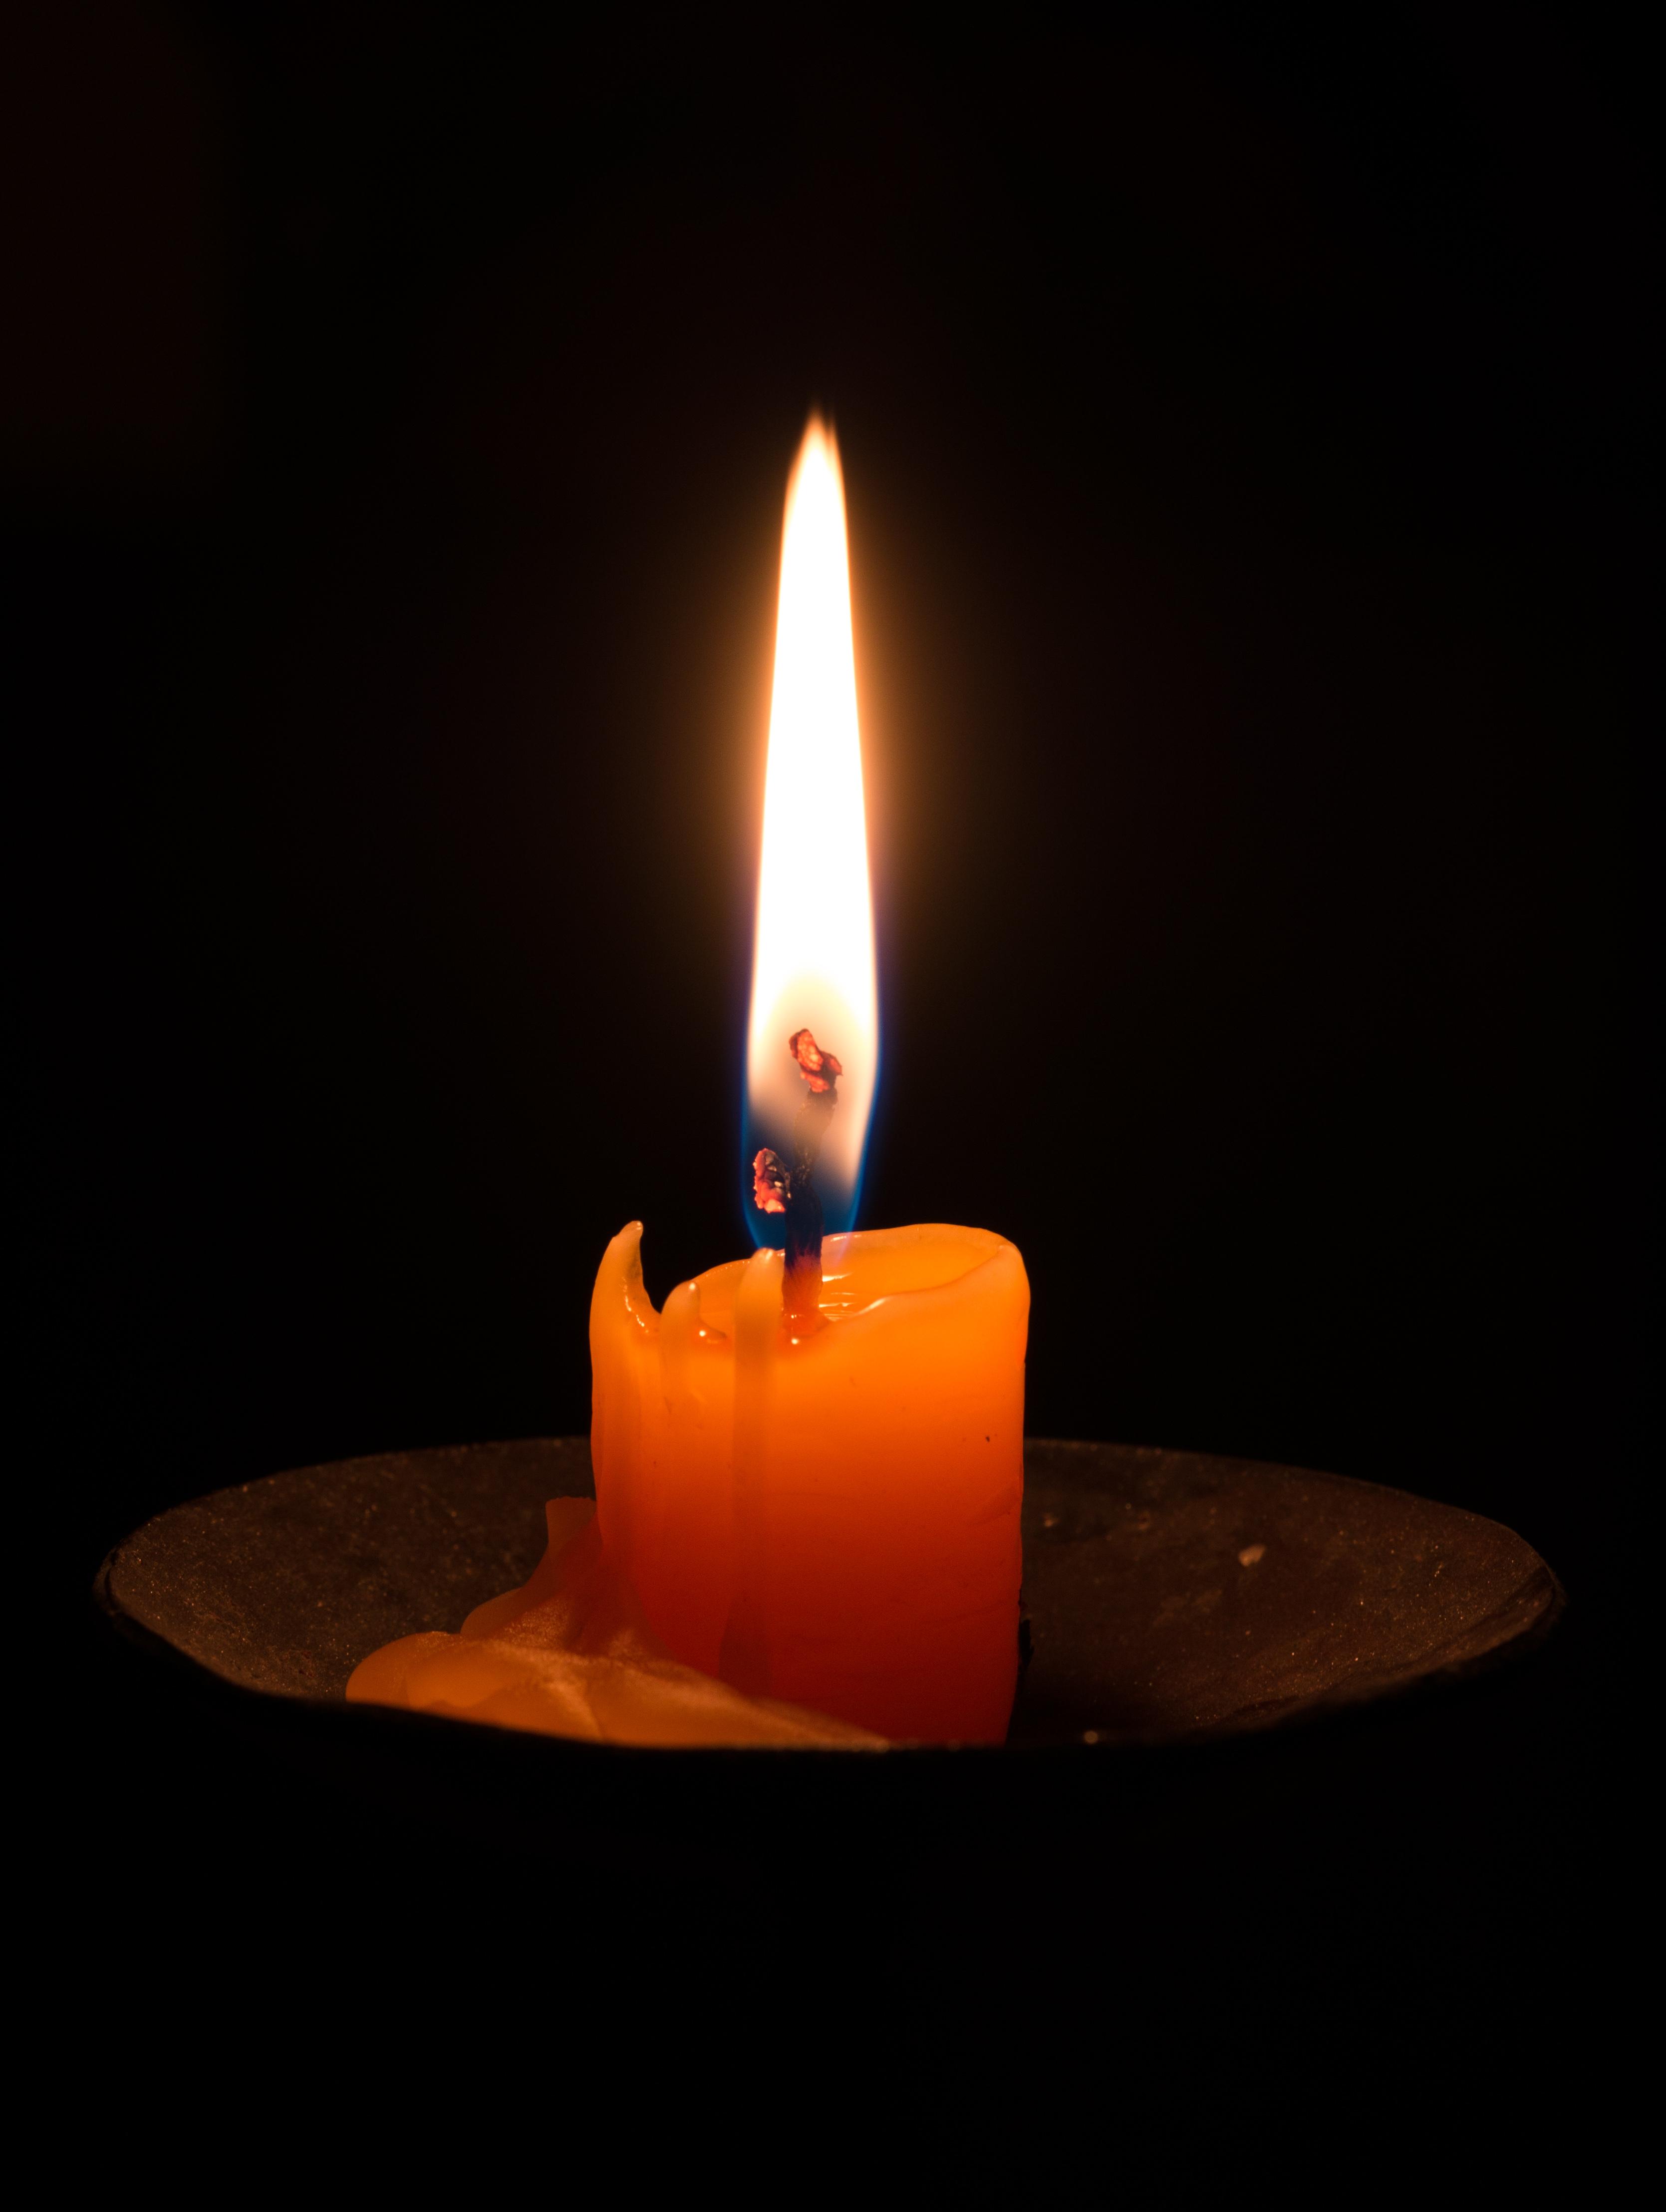 File:Candle (Slava celebration).jpg - Wikimedia Commons